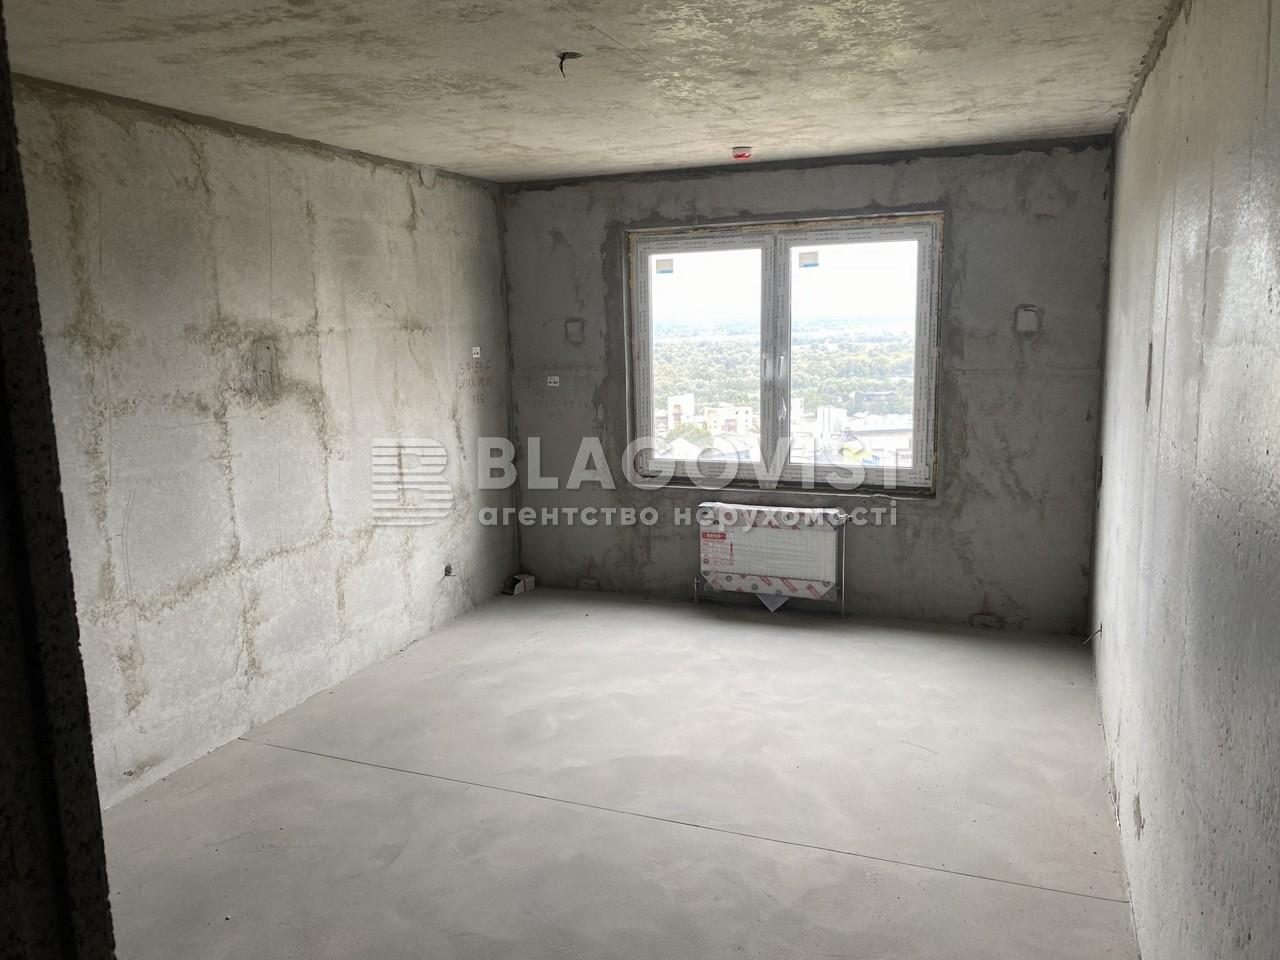 Квартира Z-812204, Моторный пер., 11, Киев - Фото 5